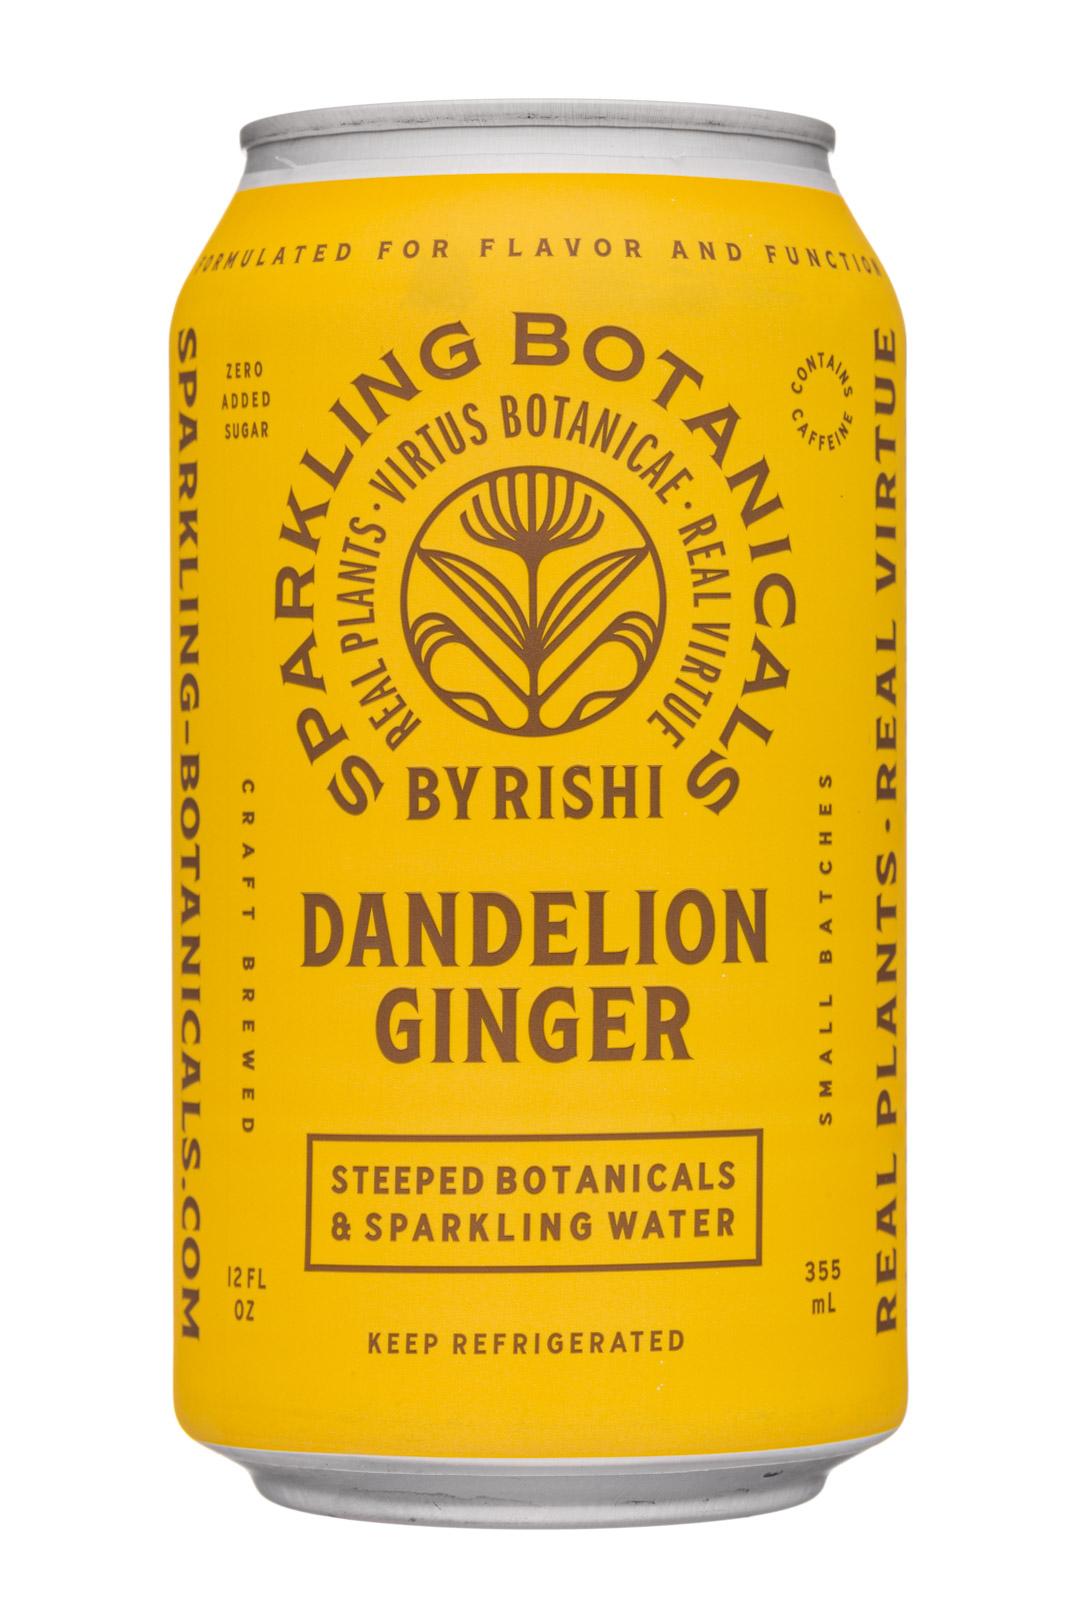 Dandelion Ginger